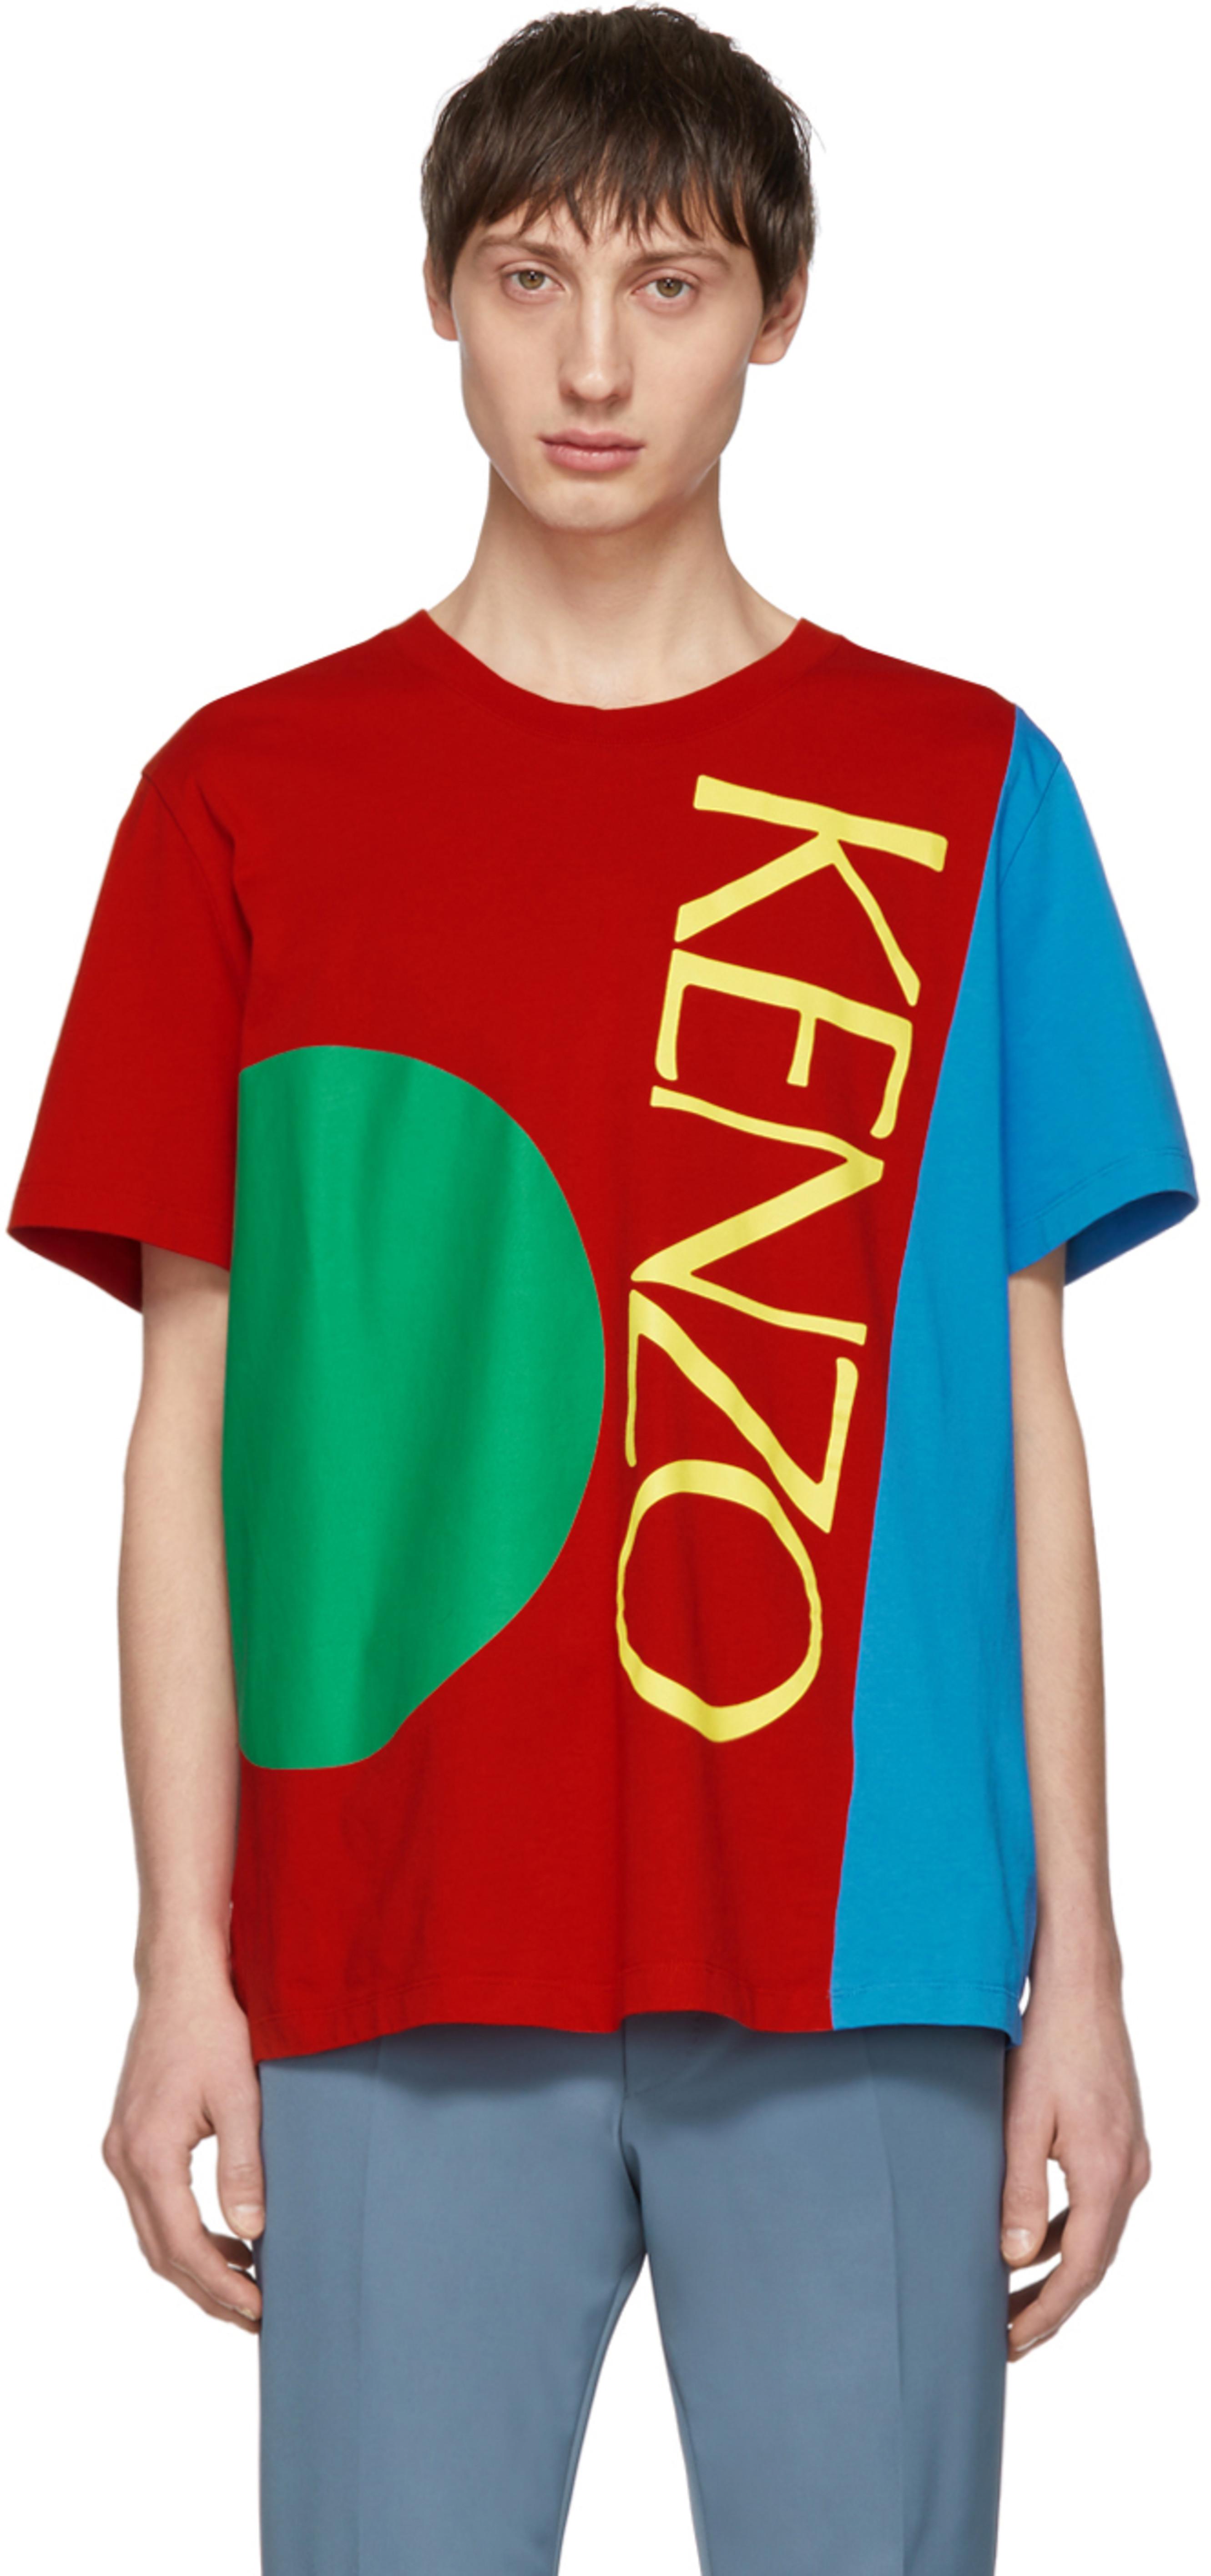 5dfc4d4e1214 Kenzo t-shirts for Men | SSENSE